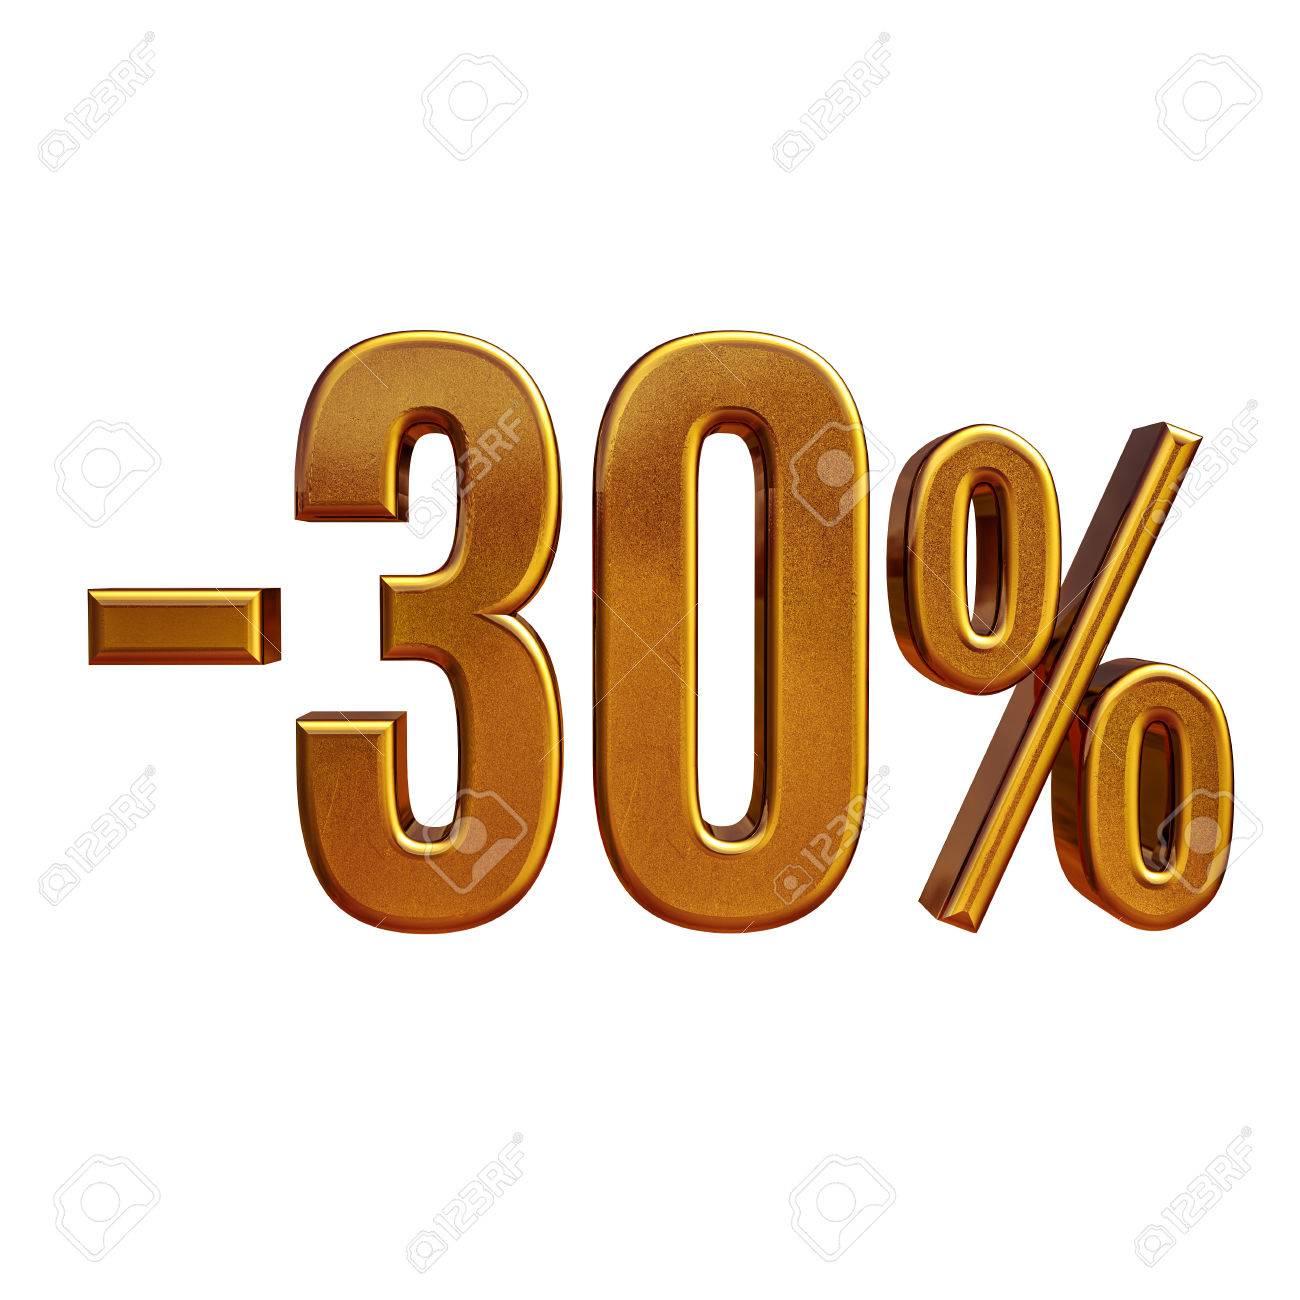 3d Render: Gold 30 Percent Off Discount Sign, Sale Banner Template ...